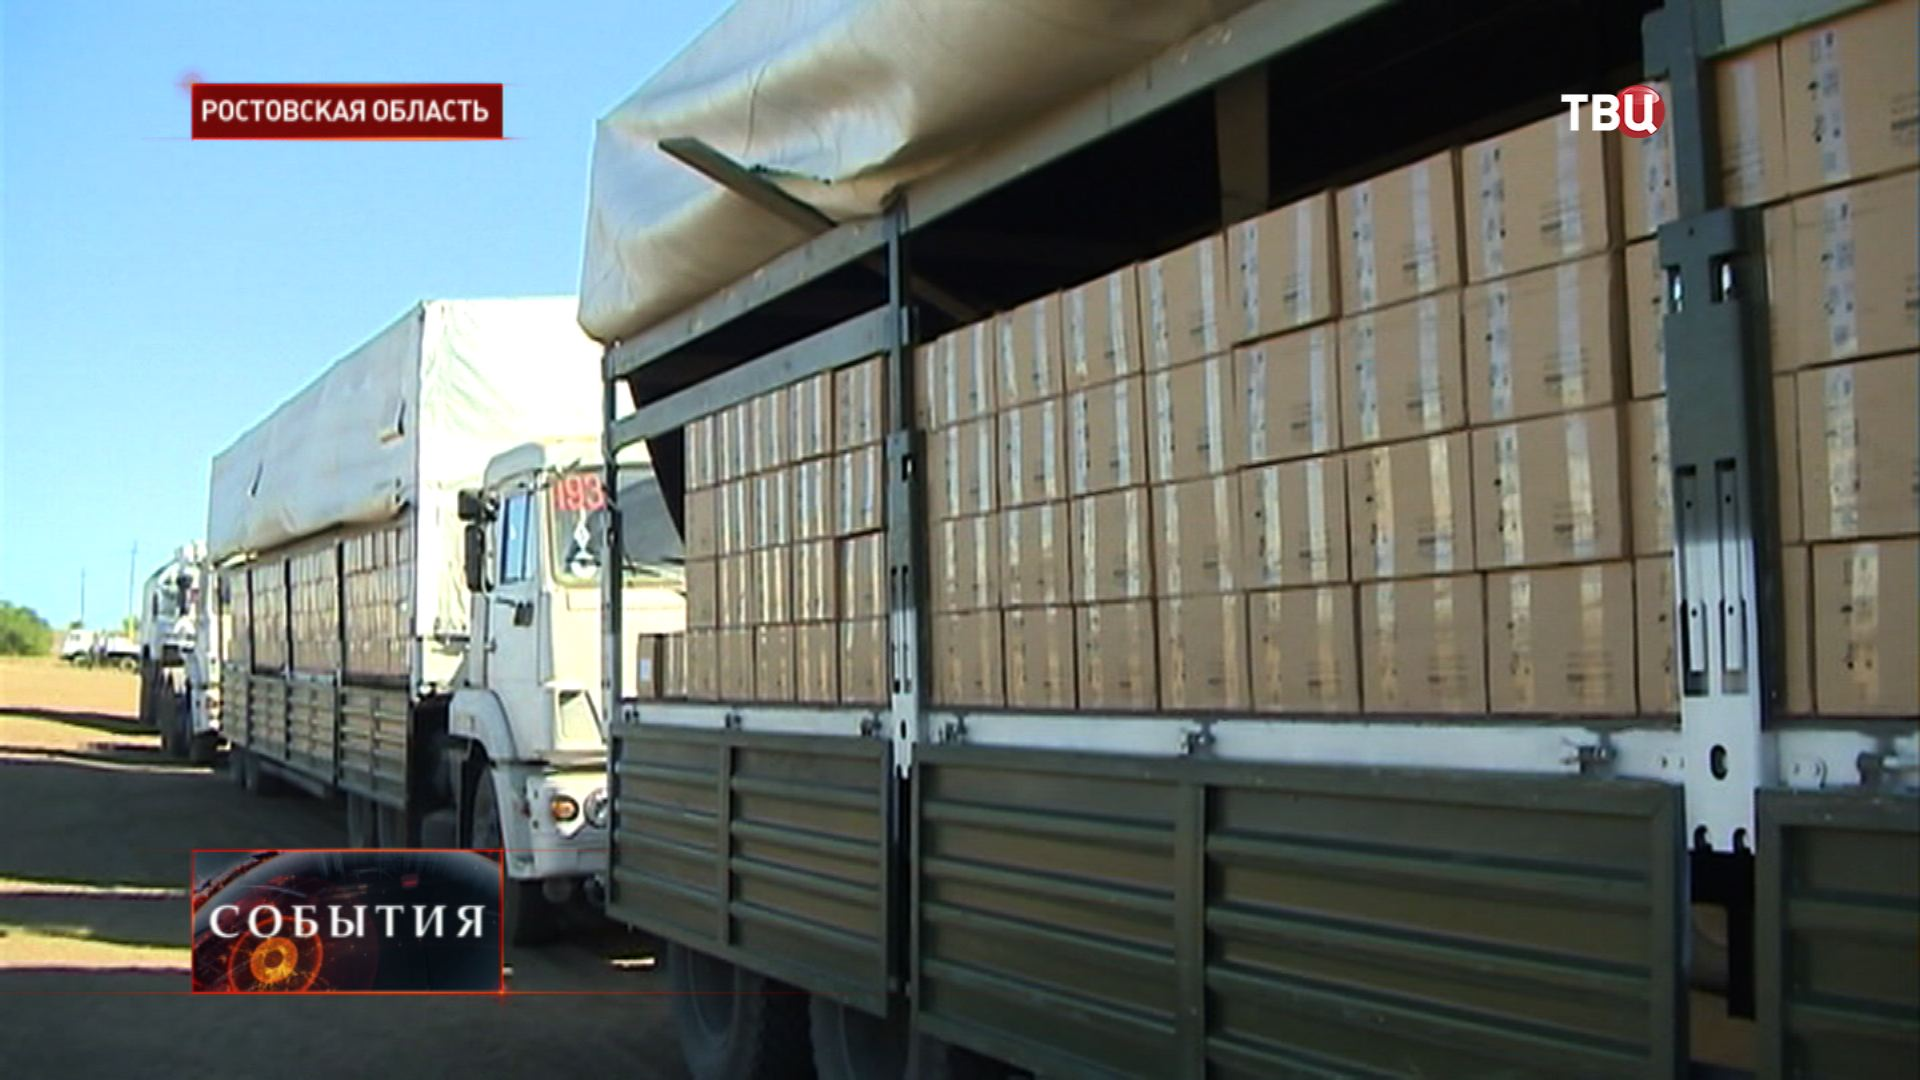 Грузовики гуманитарного конвоя МЧС России